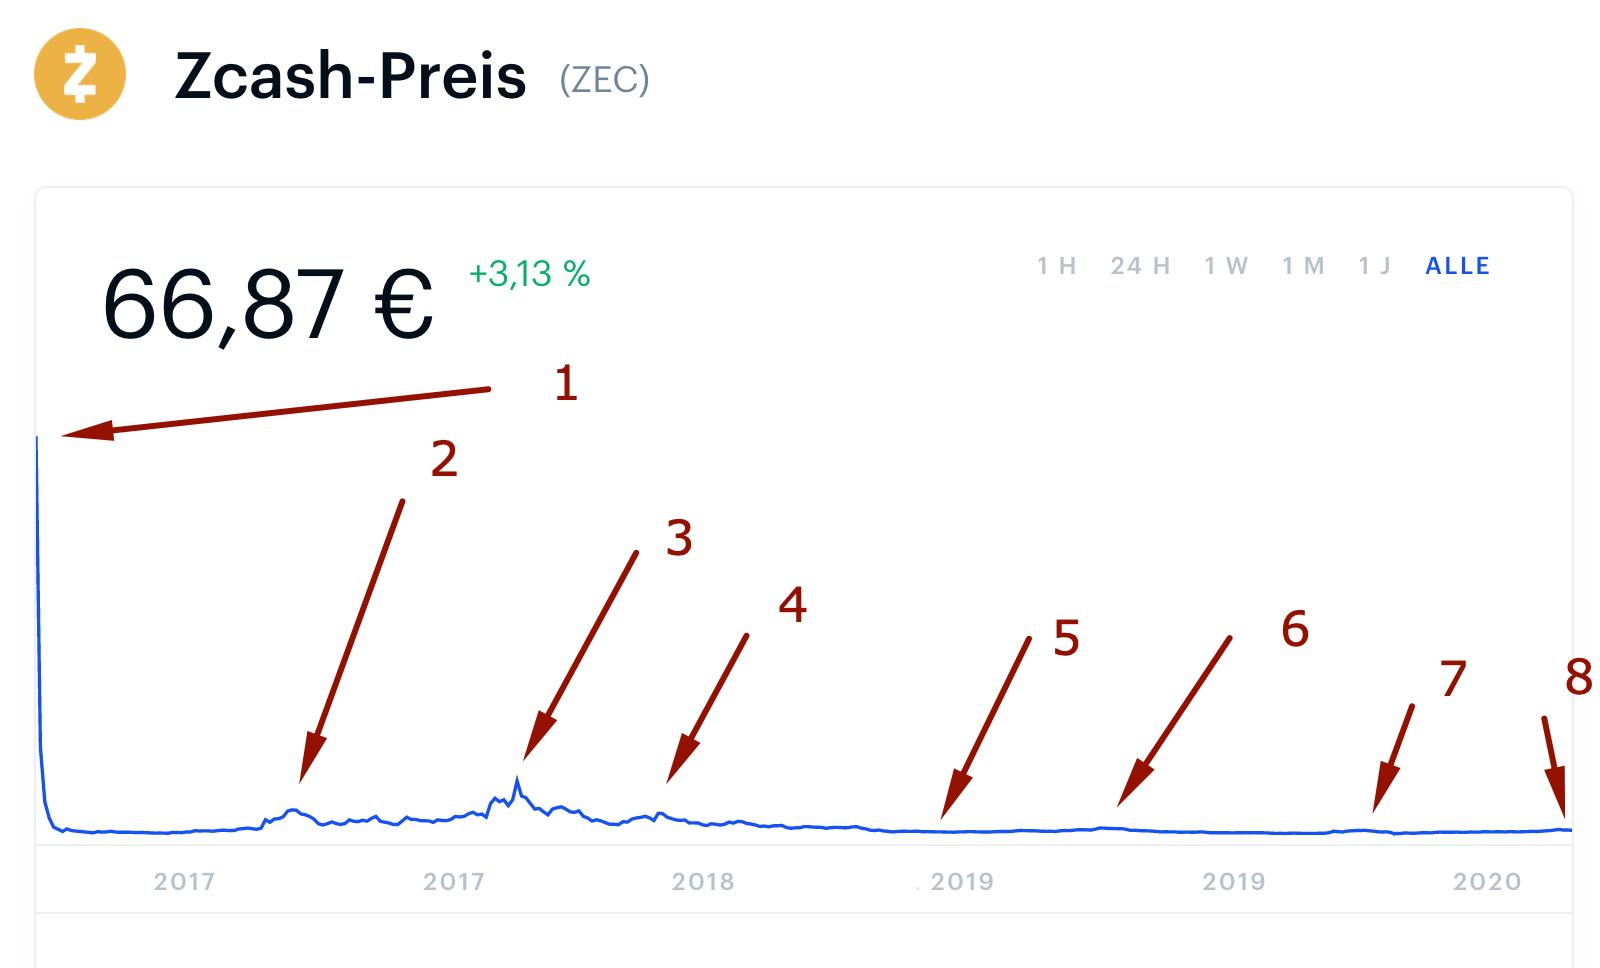 Zcash price history